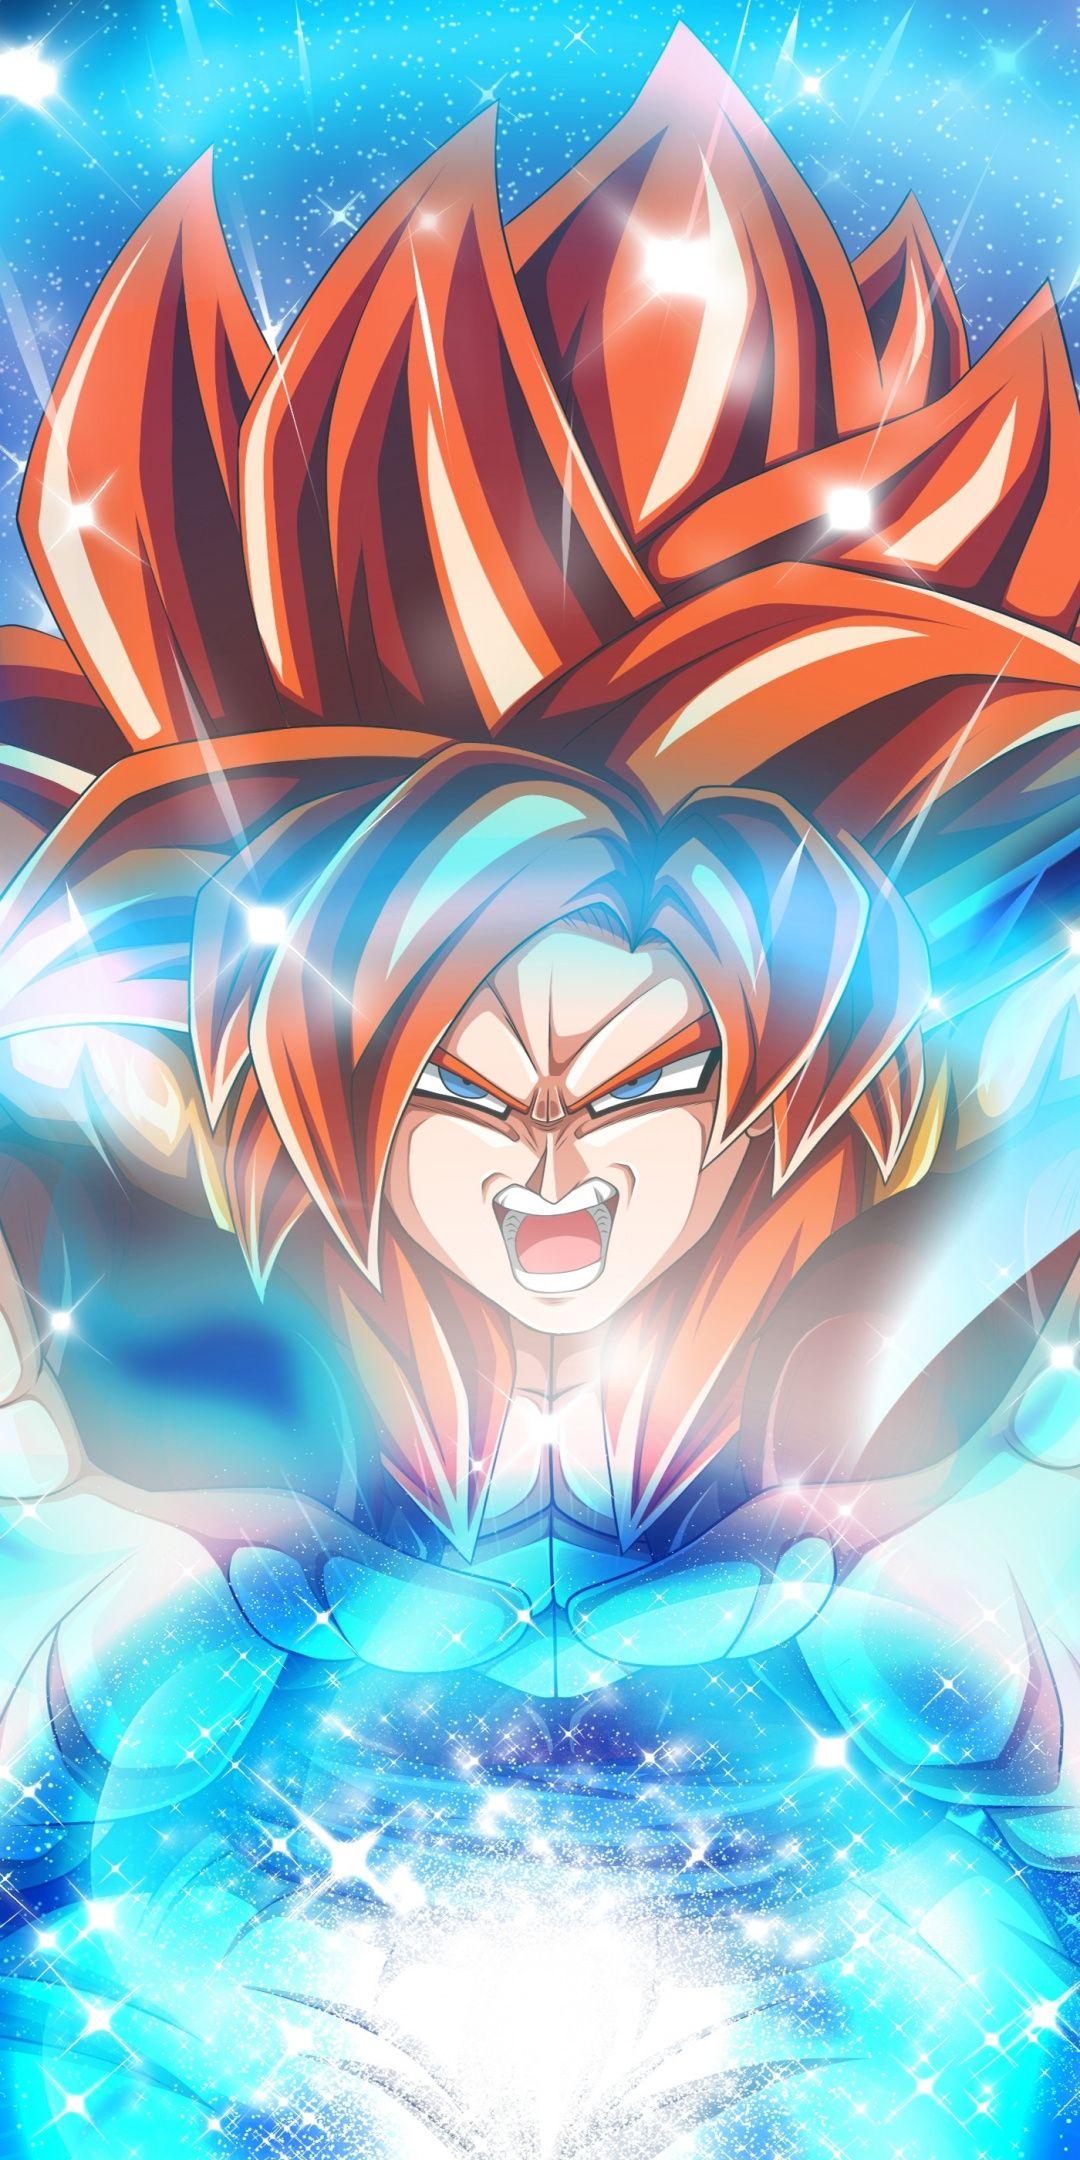 Gogeta, Dragon Ball Heroes, anime, 1080x2160 wallpaper